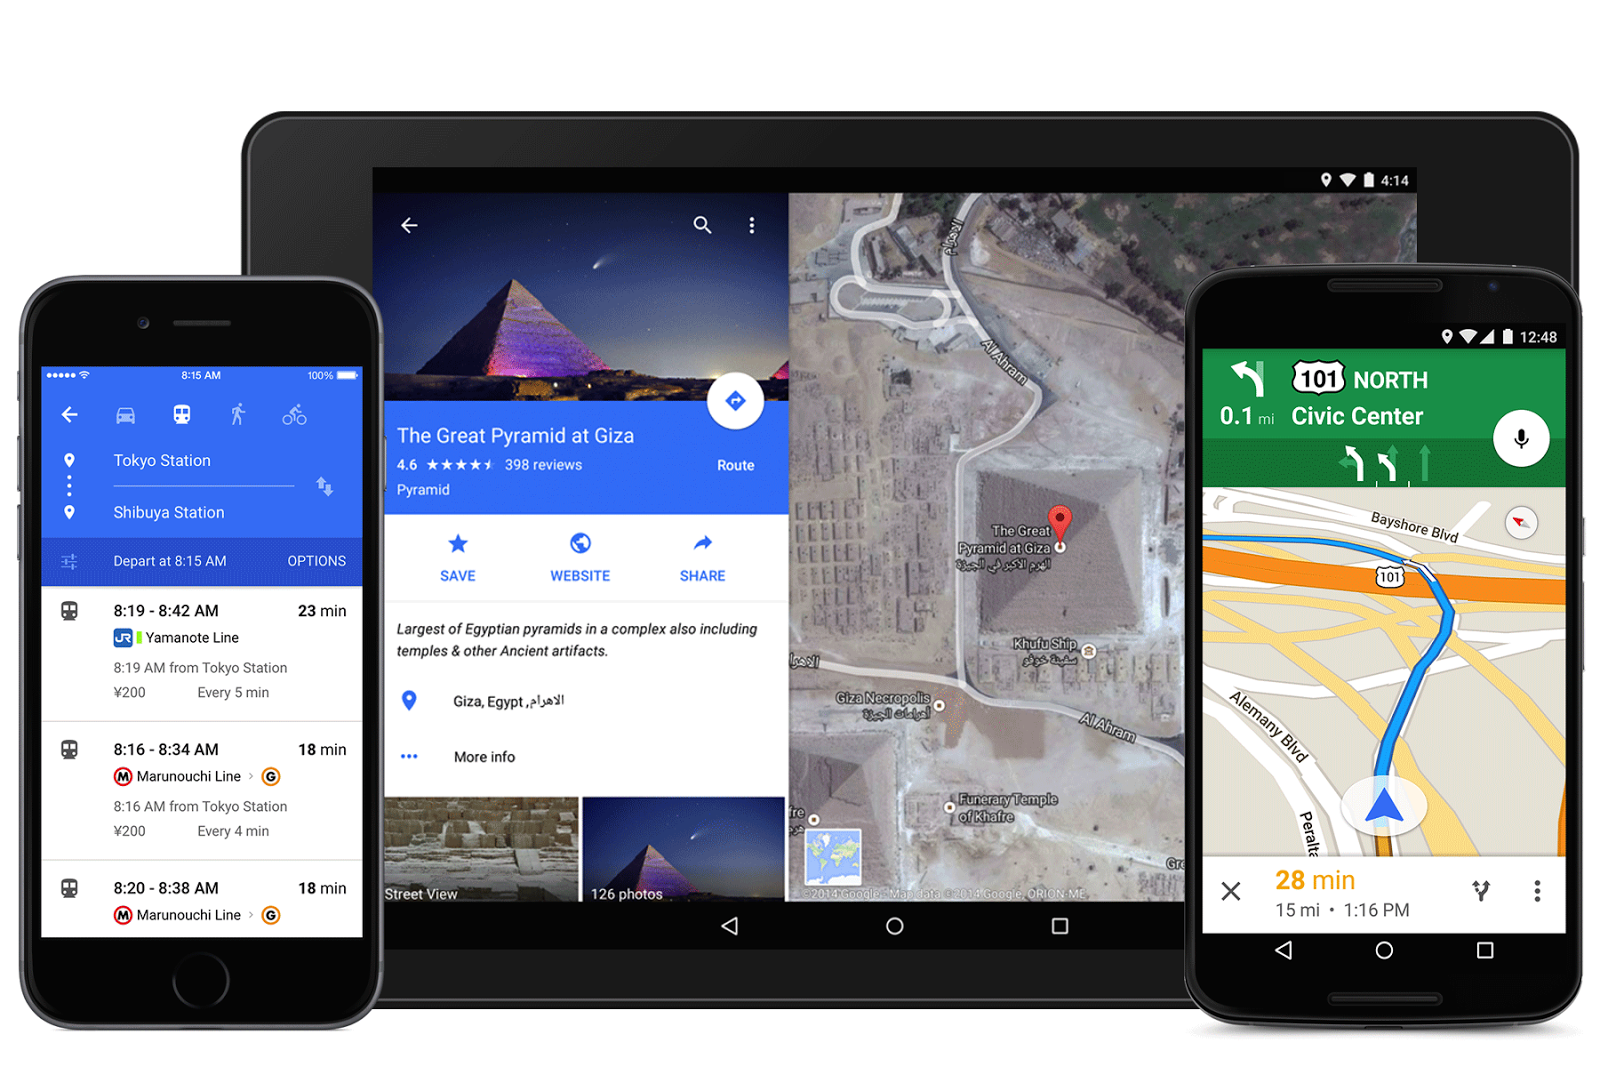 Google Maps-ը ներկայանում է նոր ֆունկցիաներով ու թարմացված դիզայնով